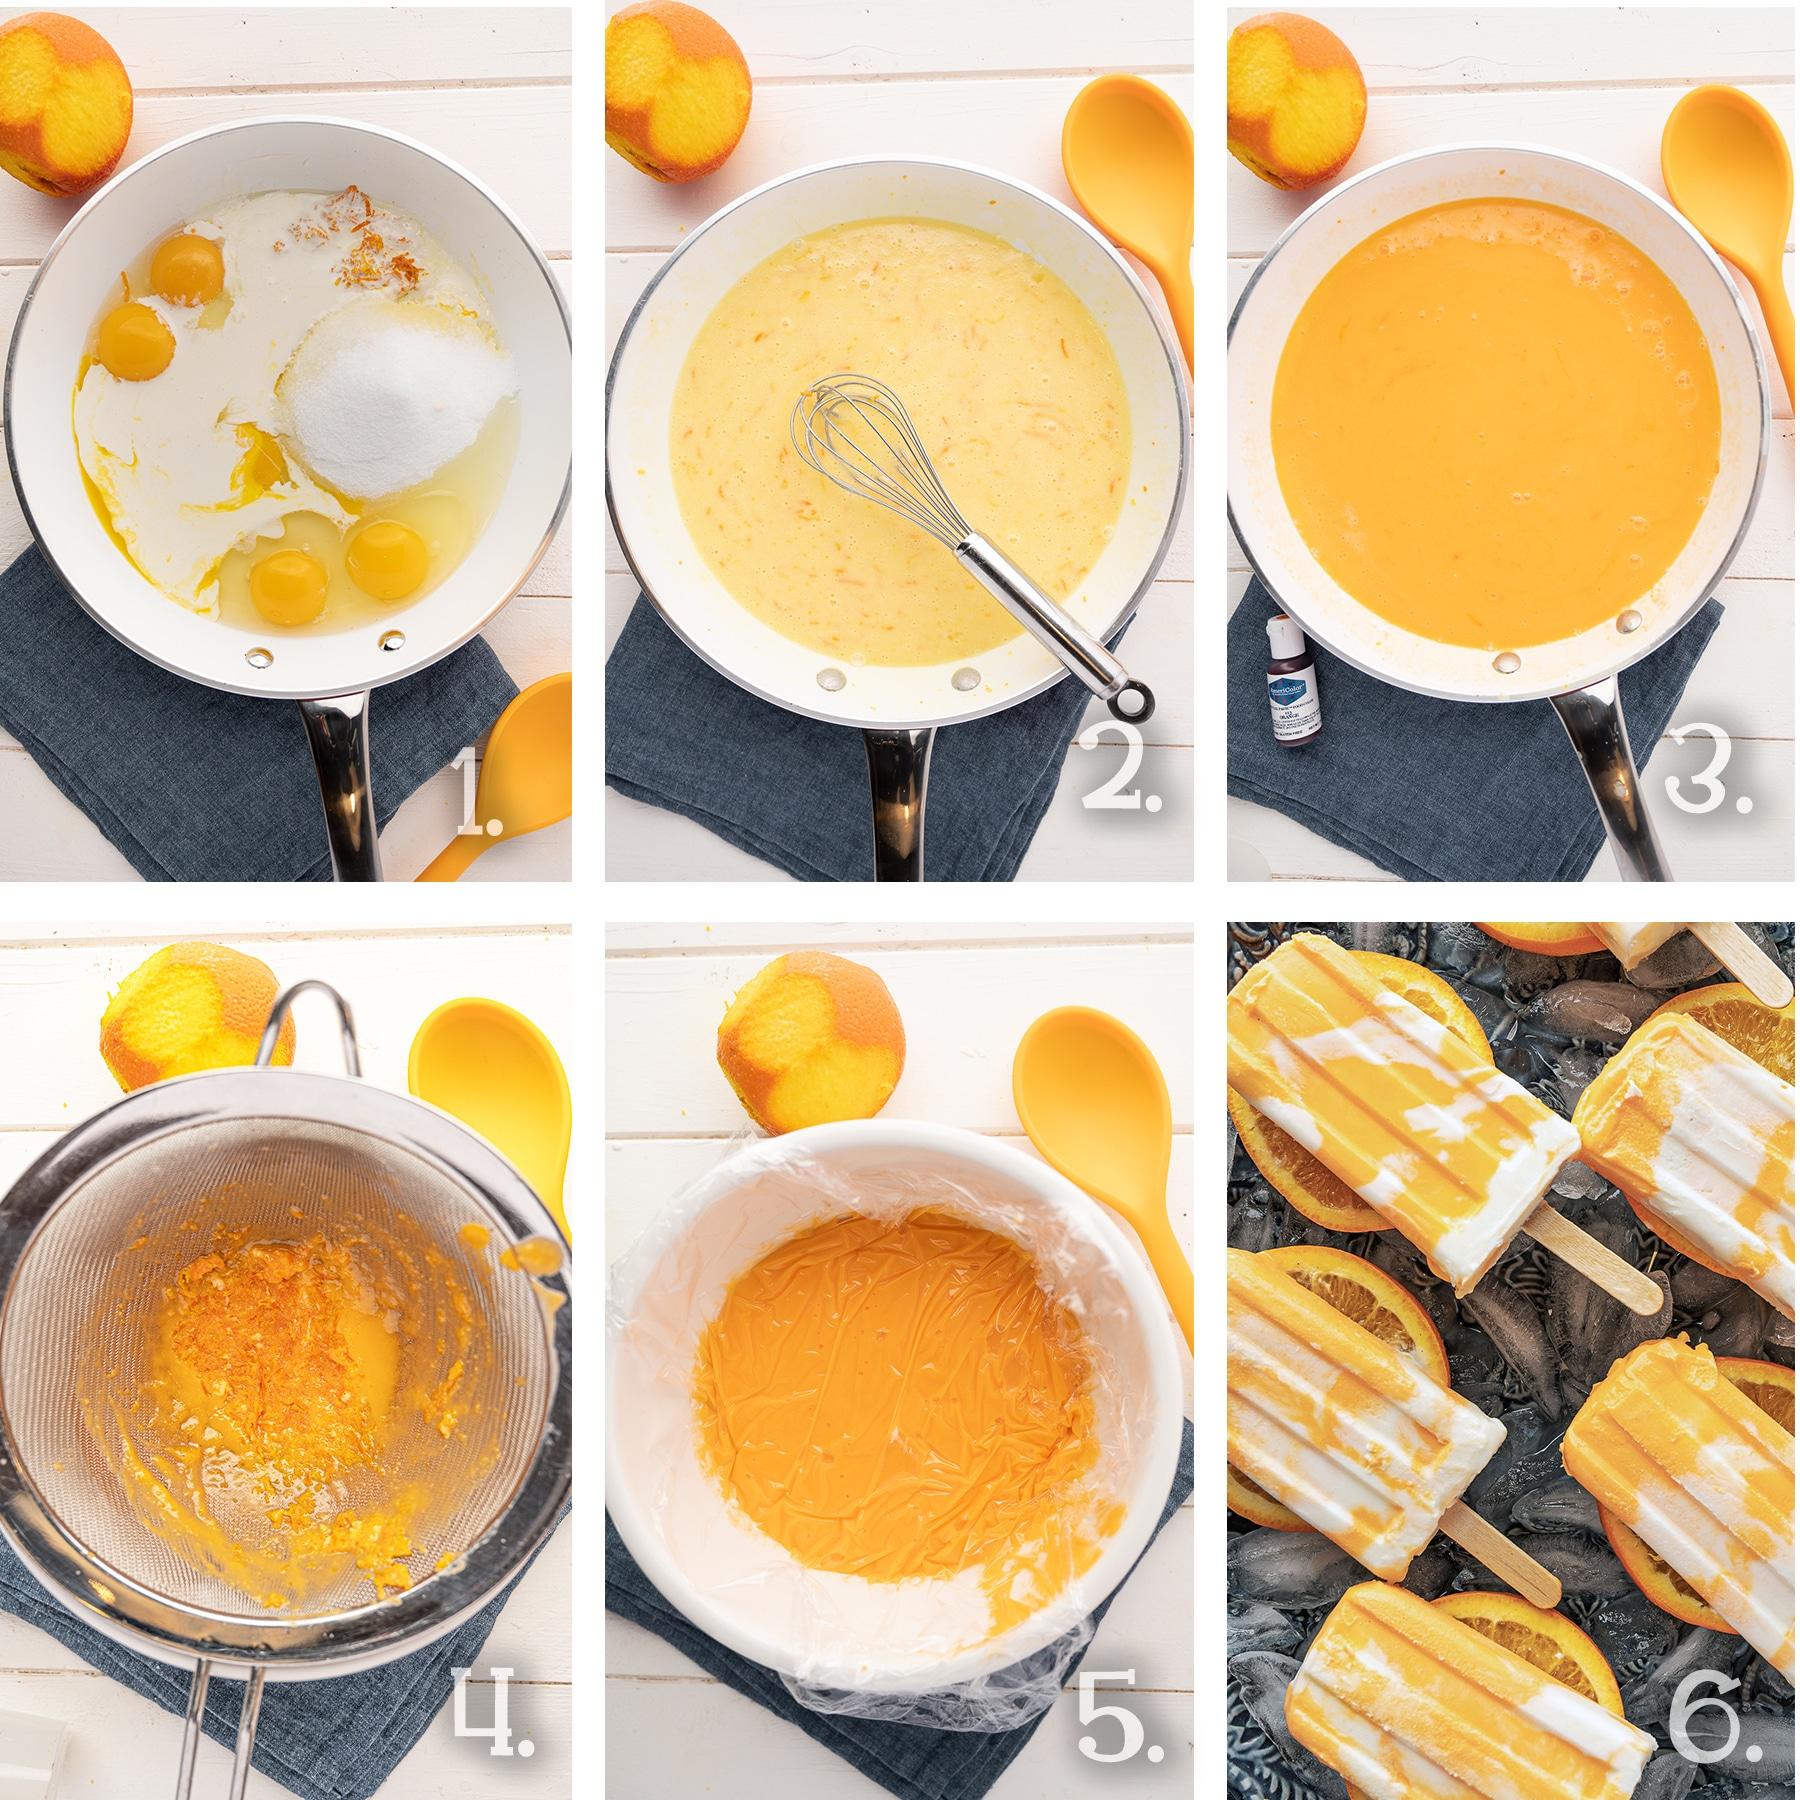 In process photographs of making orange custard